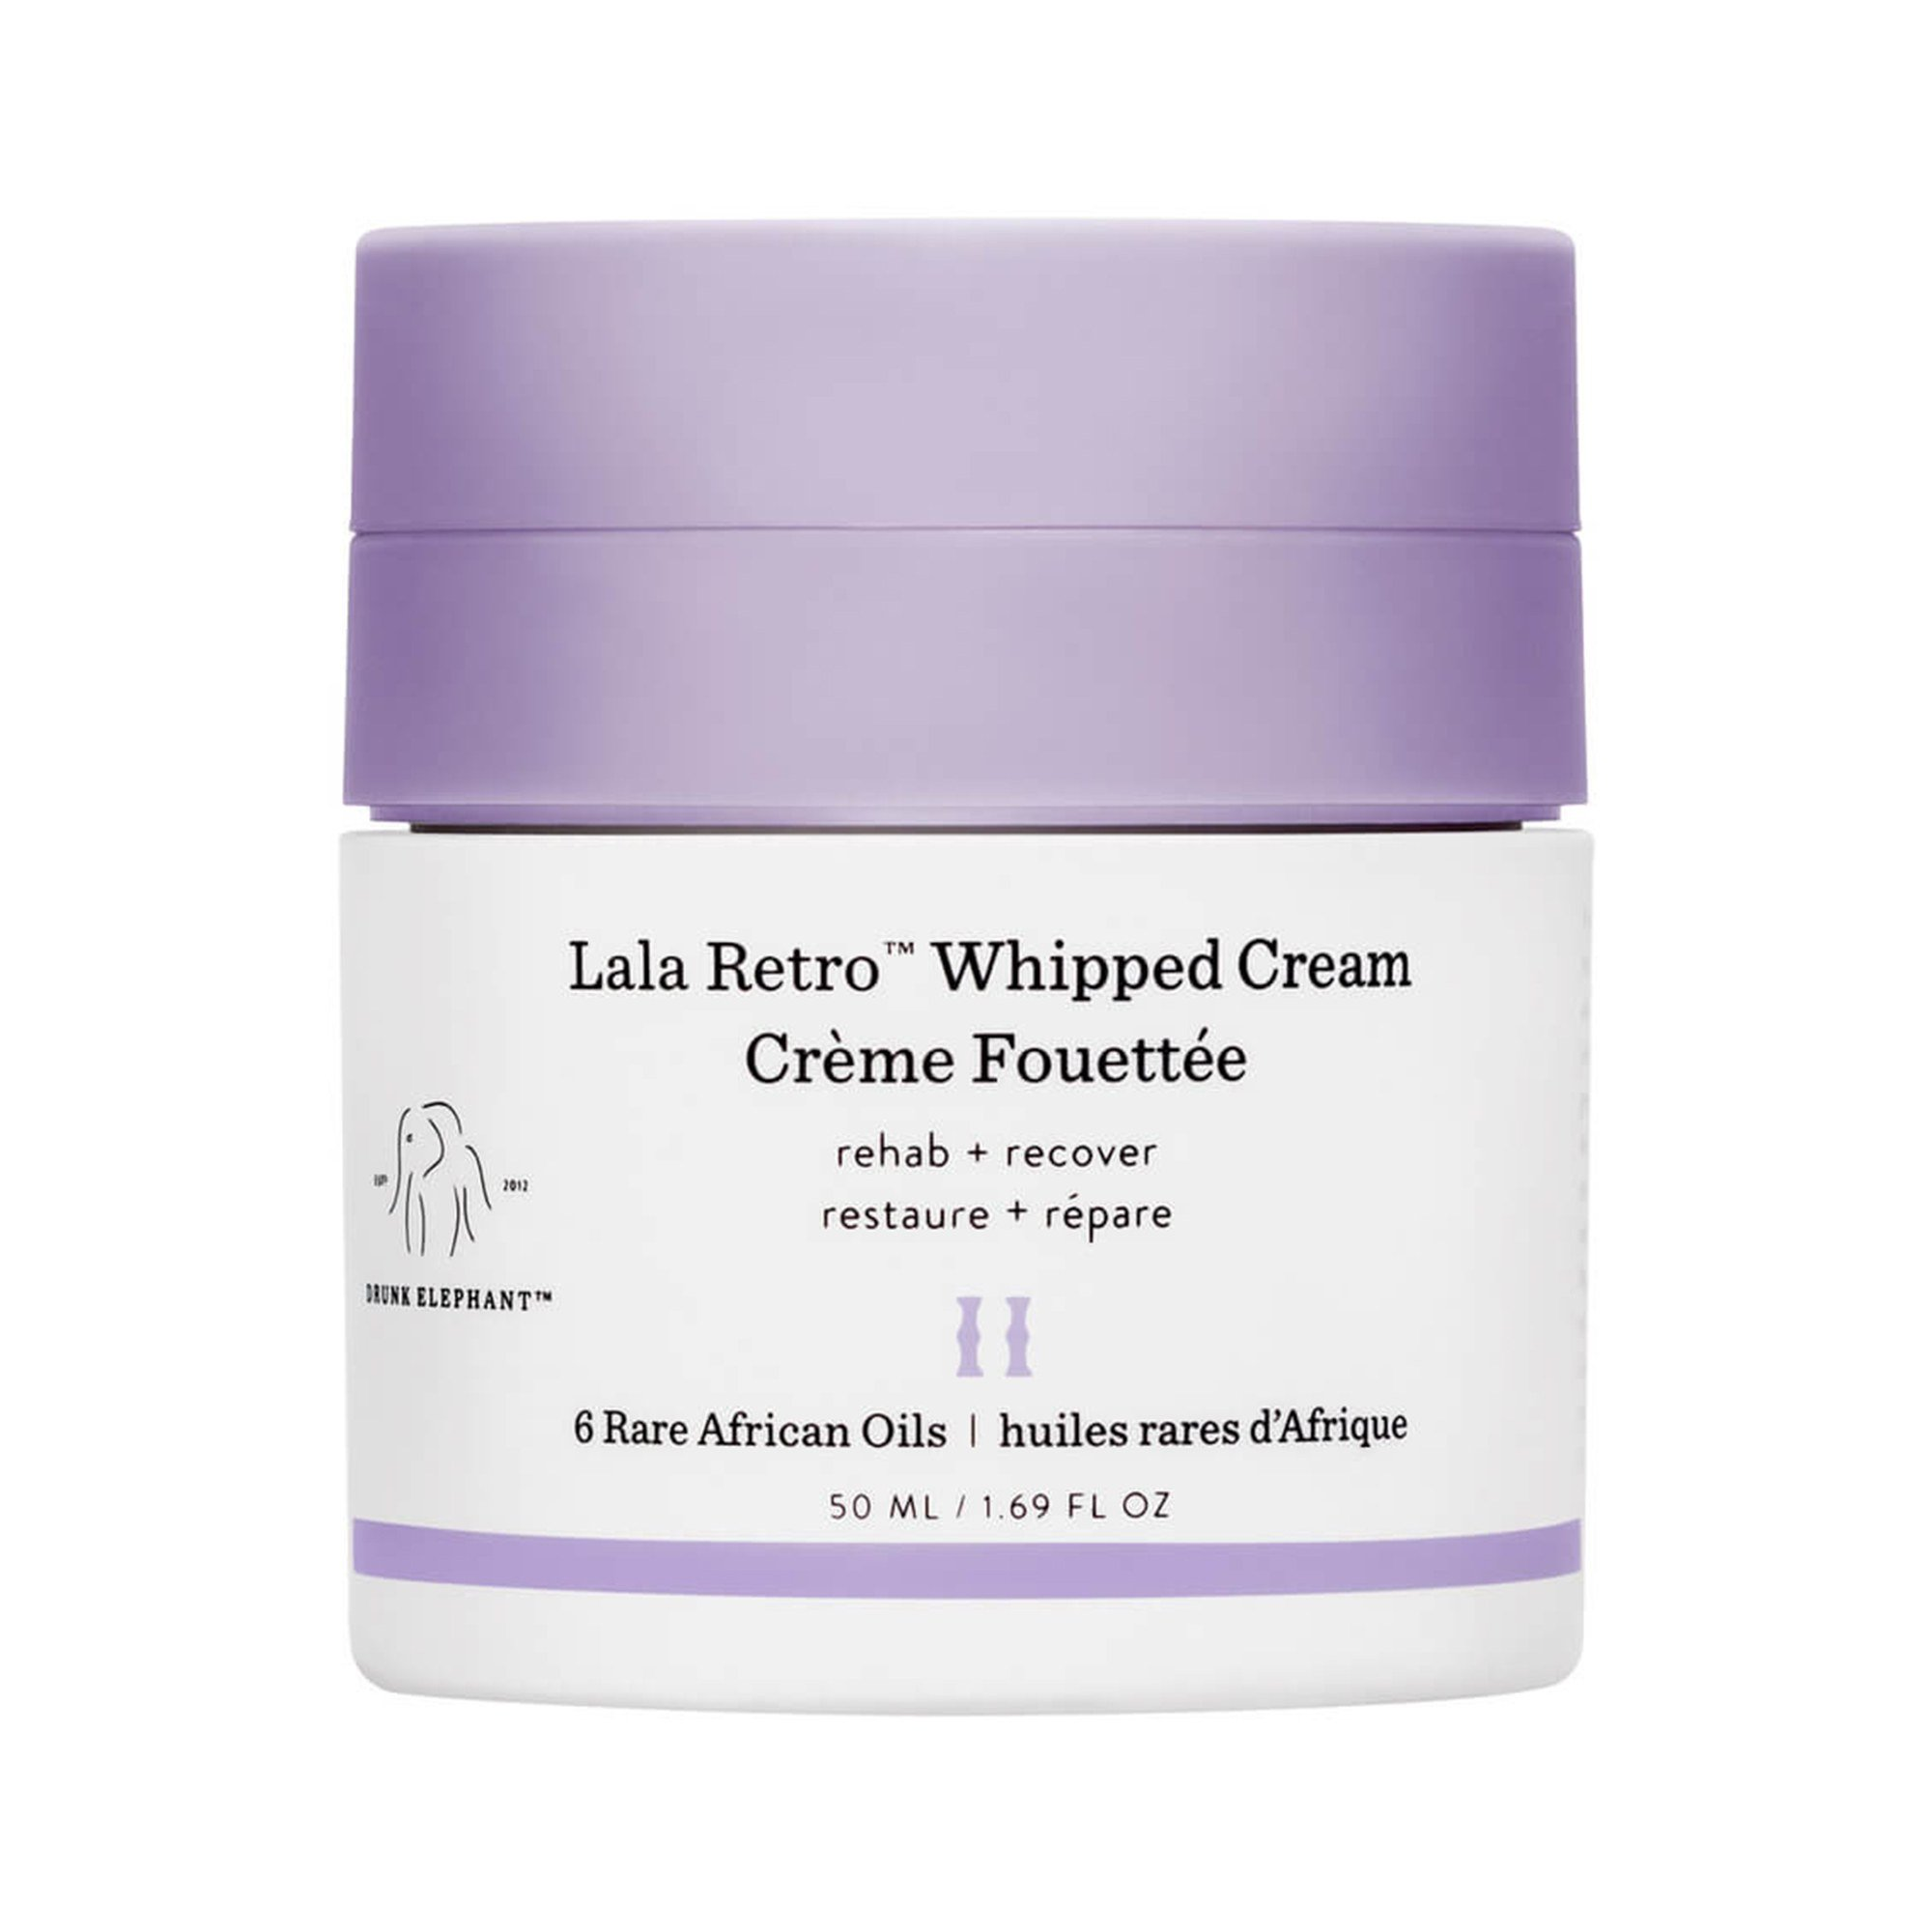 Drunk Elephant Lala Retro Whipped Cream - Anti-Aging Moisturizer for Dry Skin (1.69 fl oz)